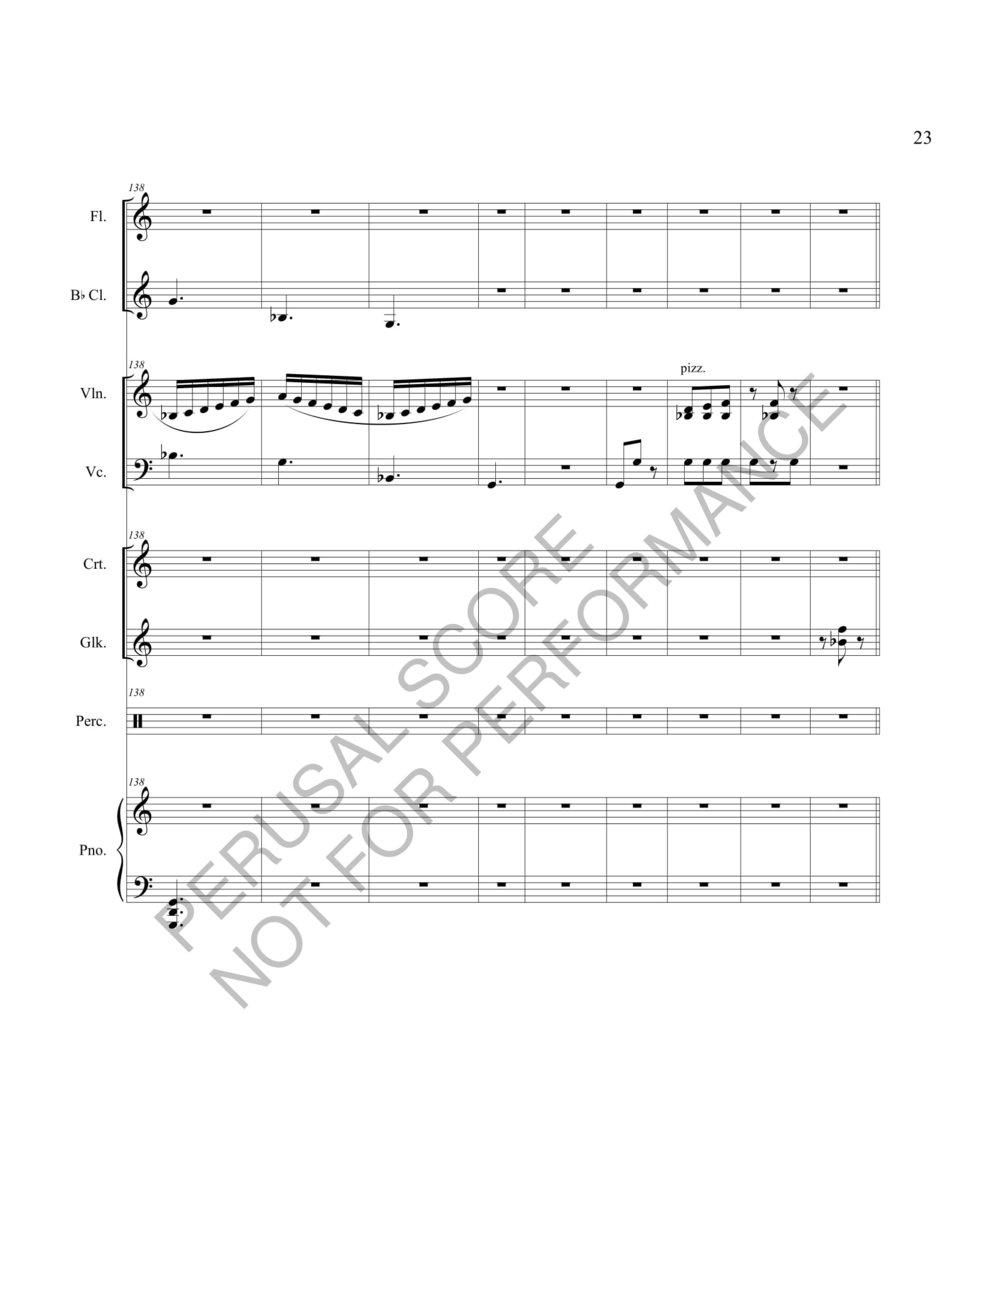 Boyd Terra Liberi Score-watermark-29.jpg